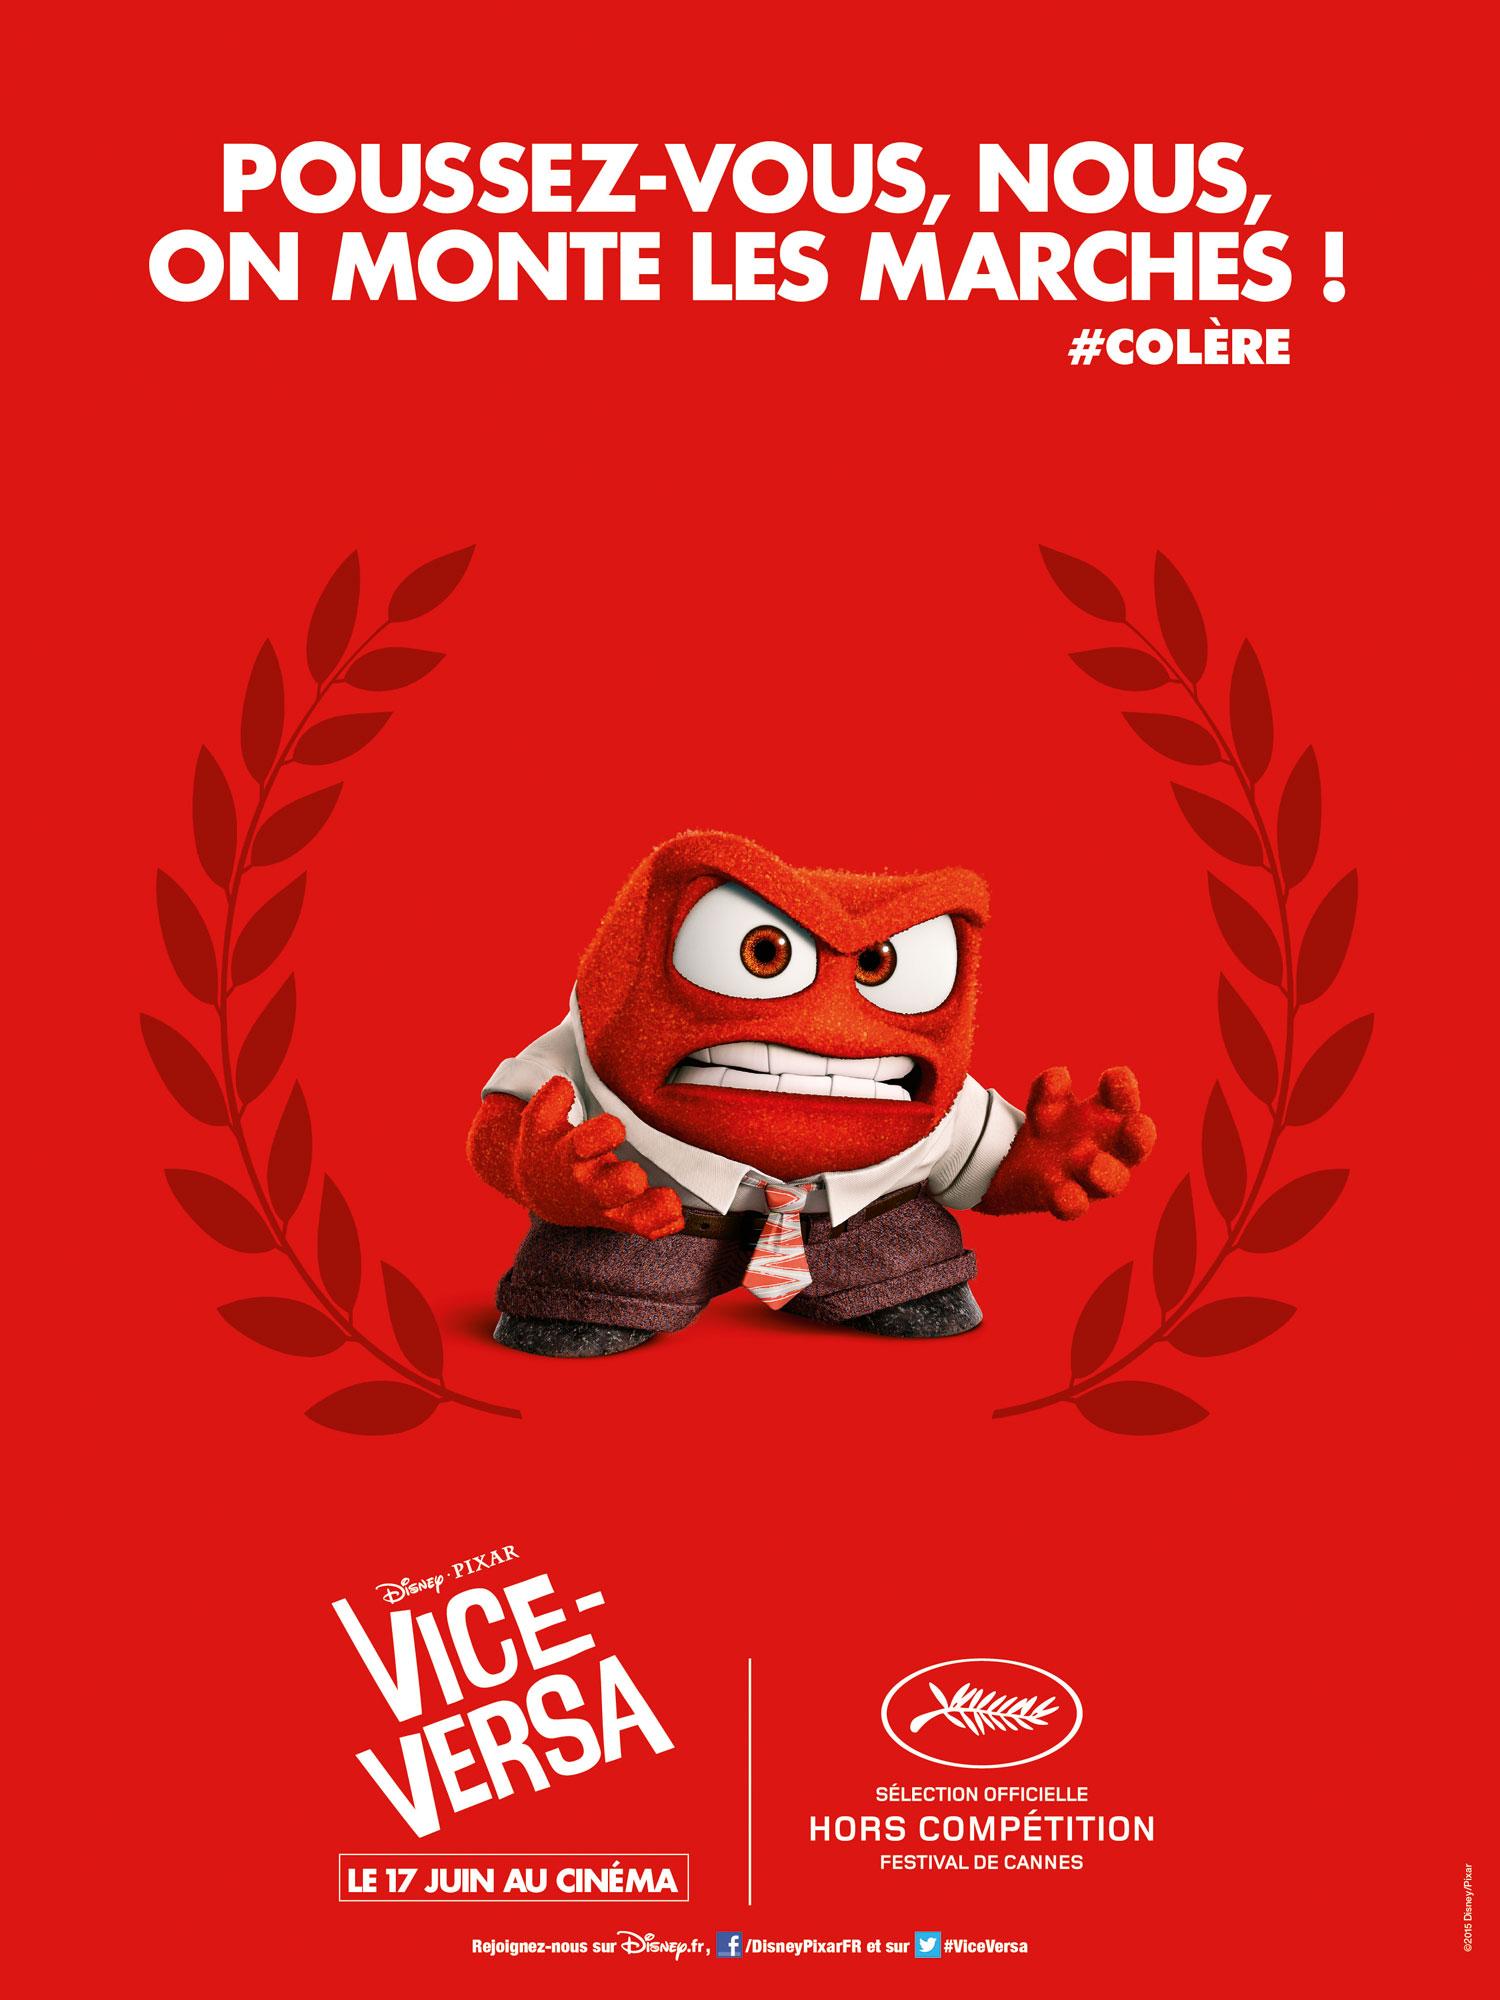 Vice Versa Inside Out Disney Pixar affiche poster festival cannes